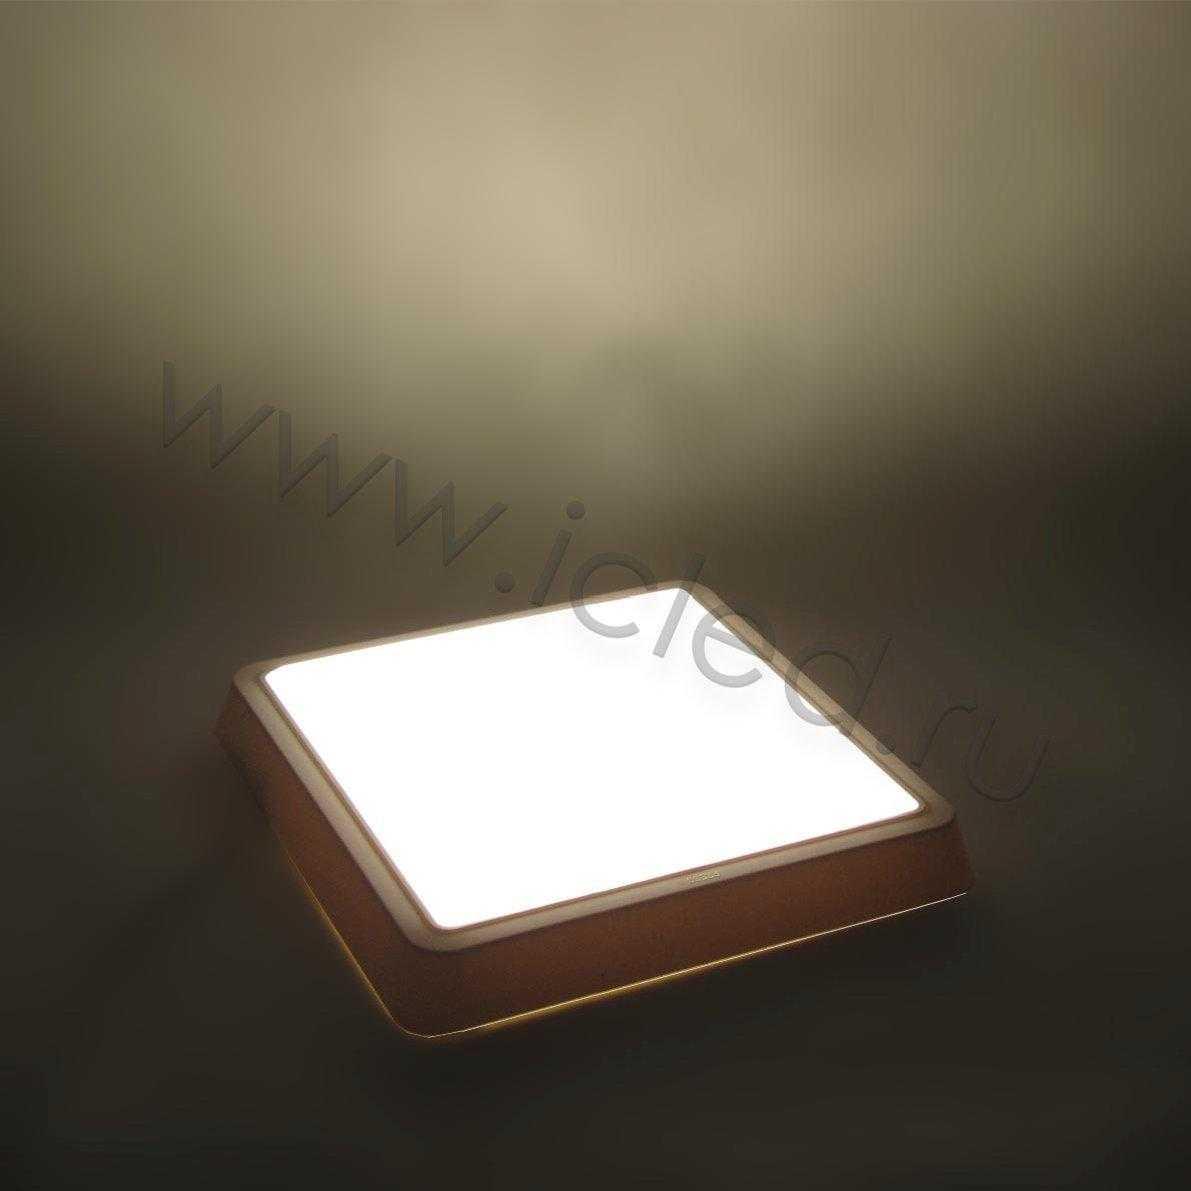 Светодиодный светильник MR-SW L270 (16W, Warm White)